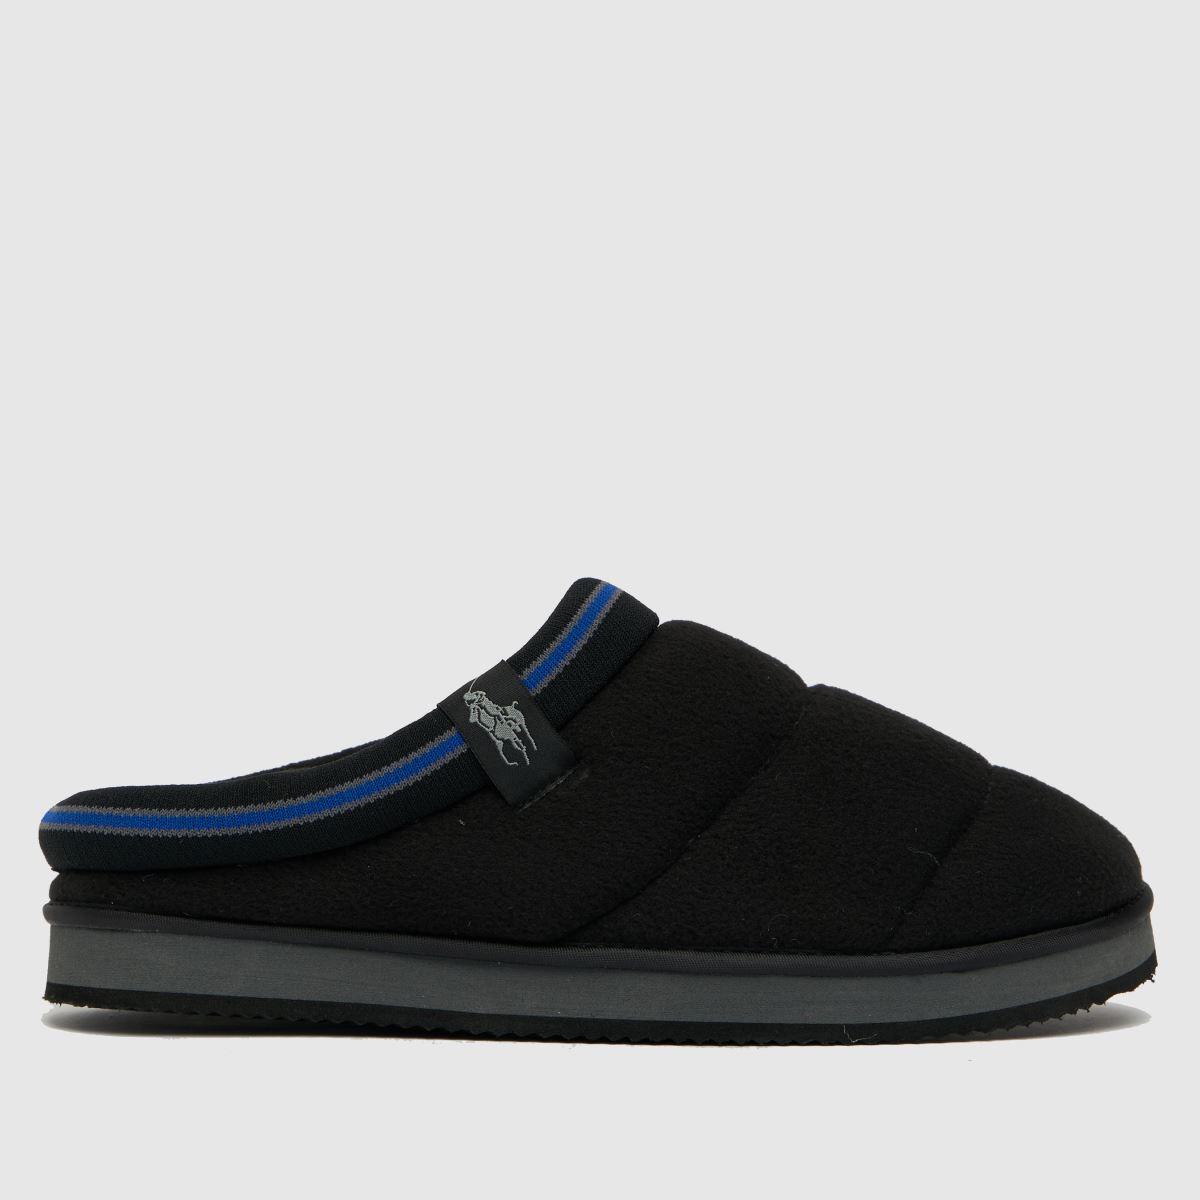 Polo Ralph Lauren Black Sutton Slippers